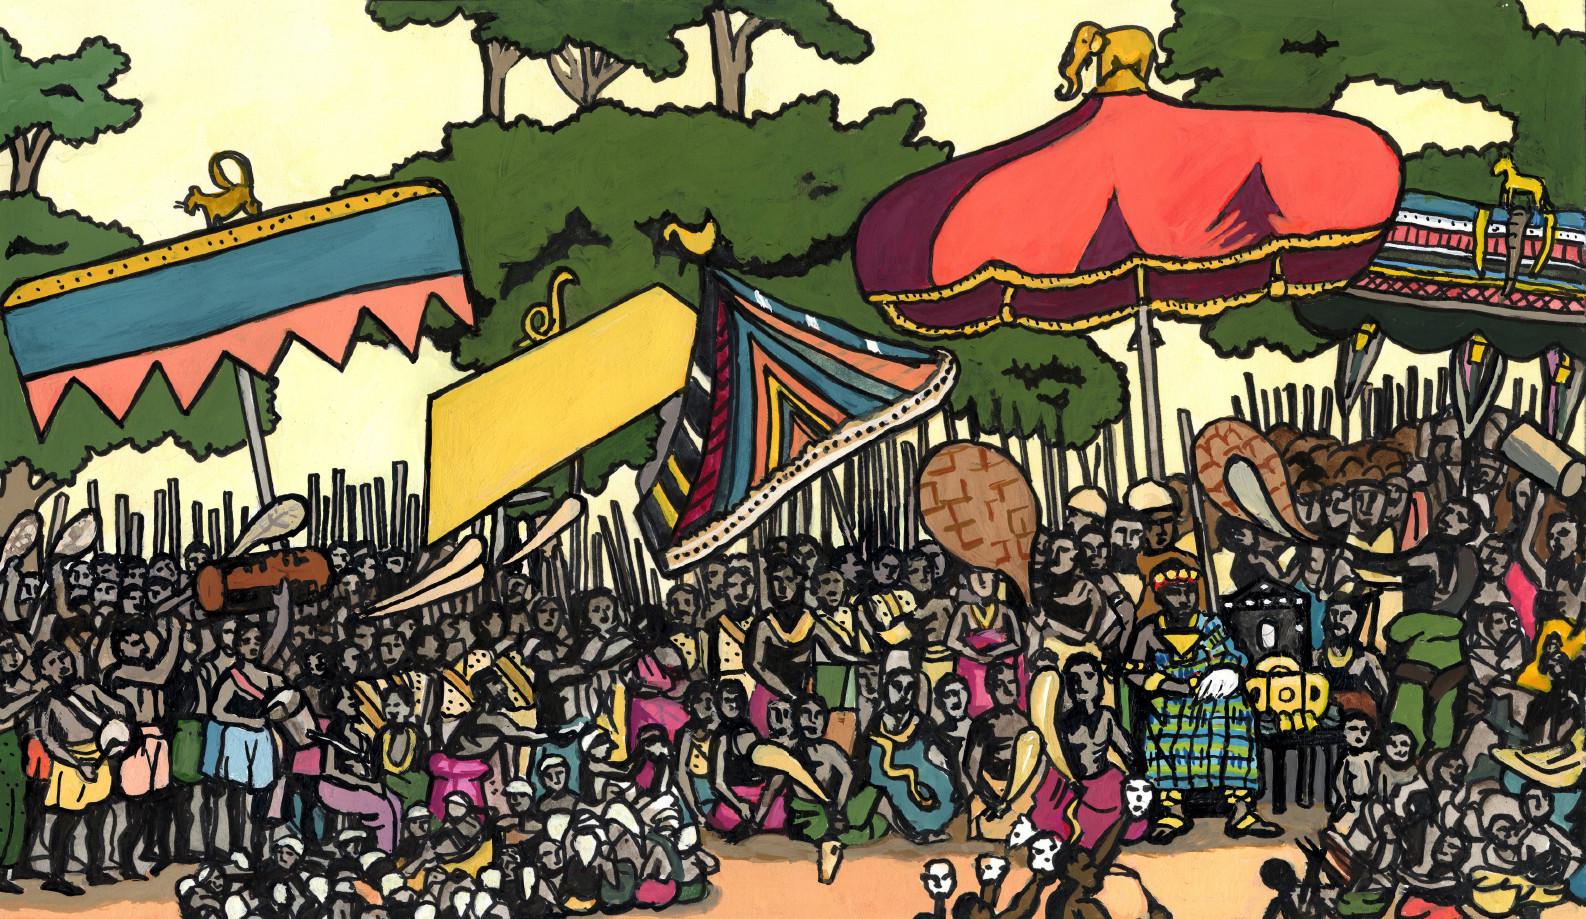 The Odwira festival in Kumasi